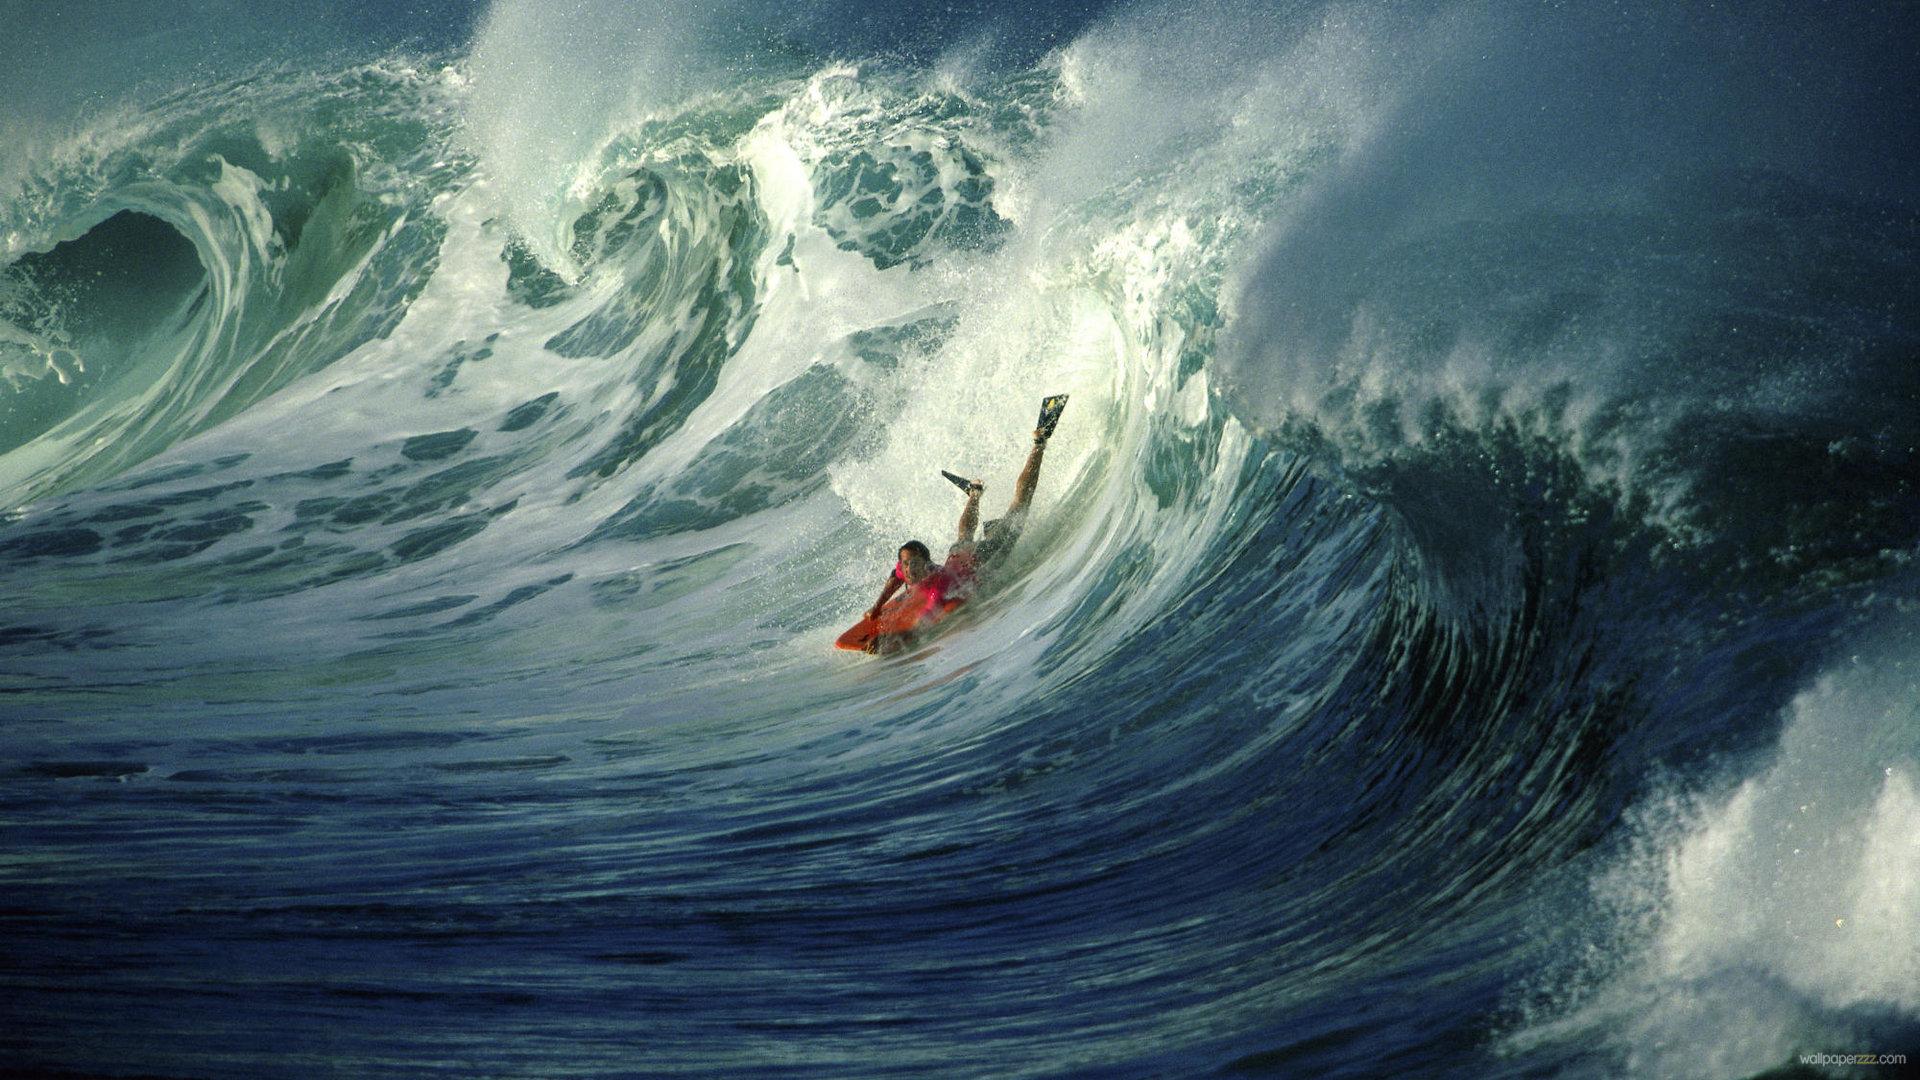 Download Surfing HD Wallpaper Wallpaper 1920x1080